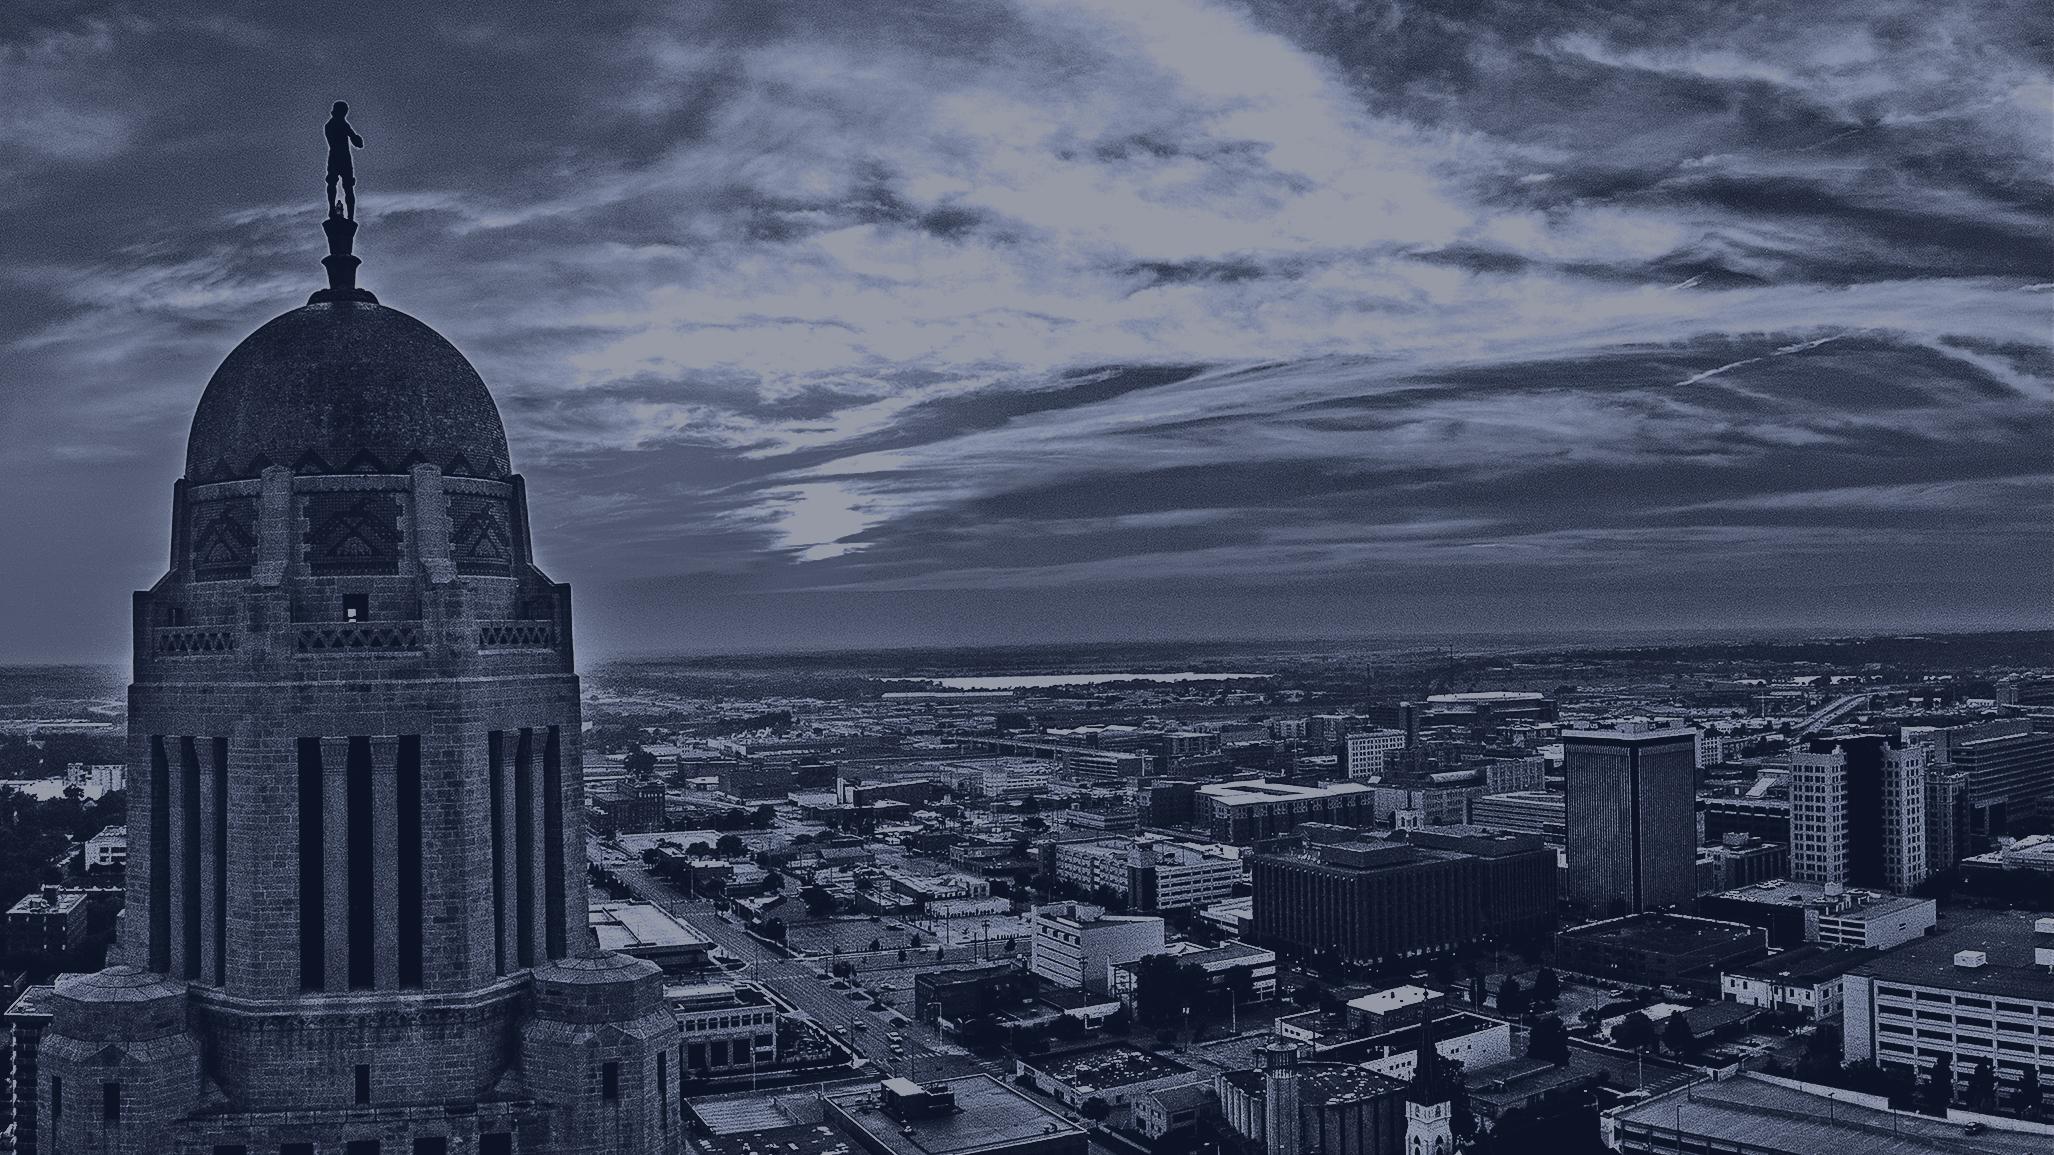 Building an electorate representative of all Nebraskans.